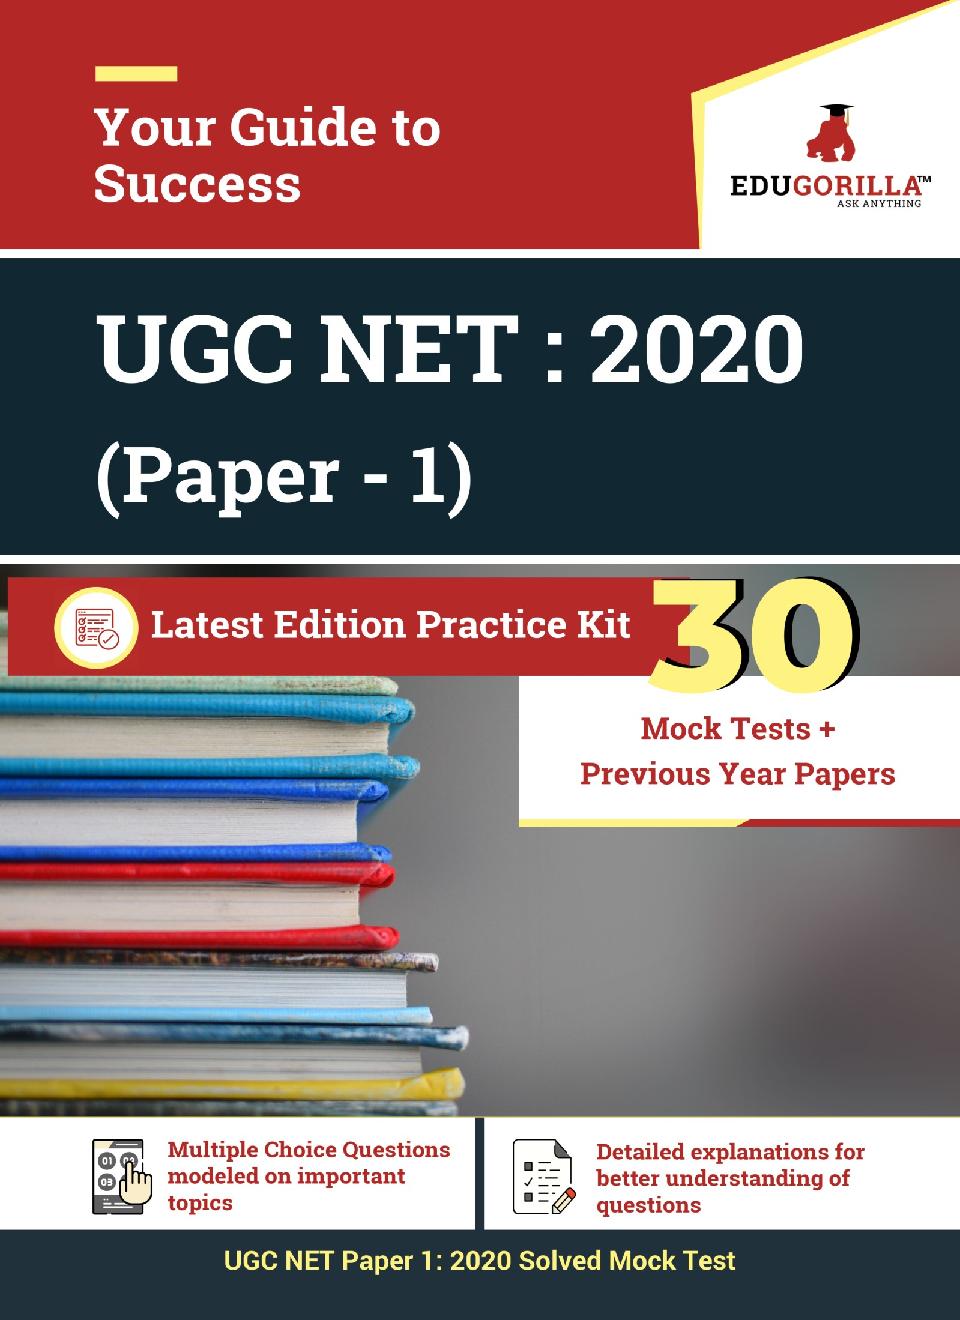 EduGorilla UGC NET : 2020 (Paper - 1) Latest Edition Practice Kit - Page 1